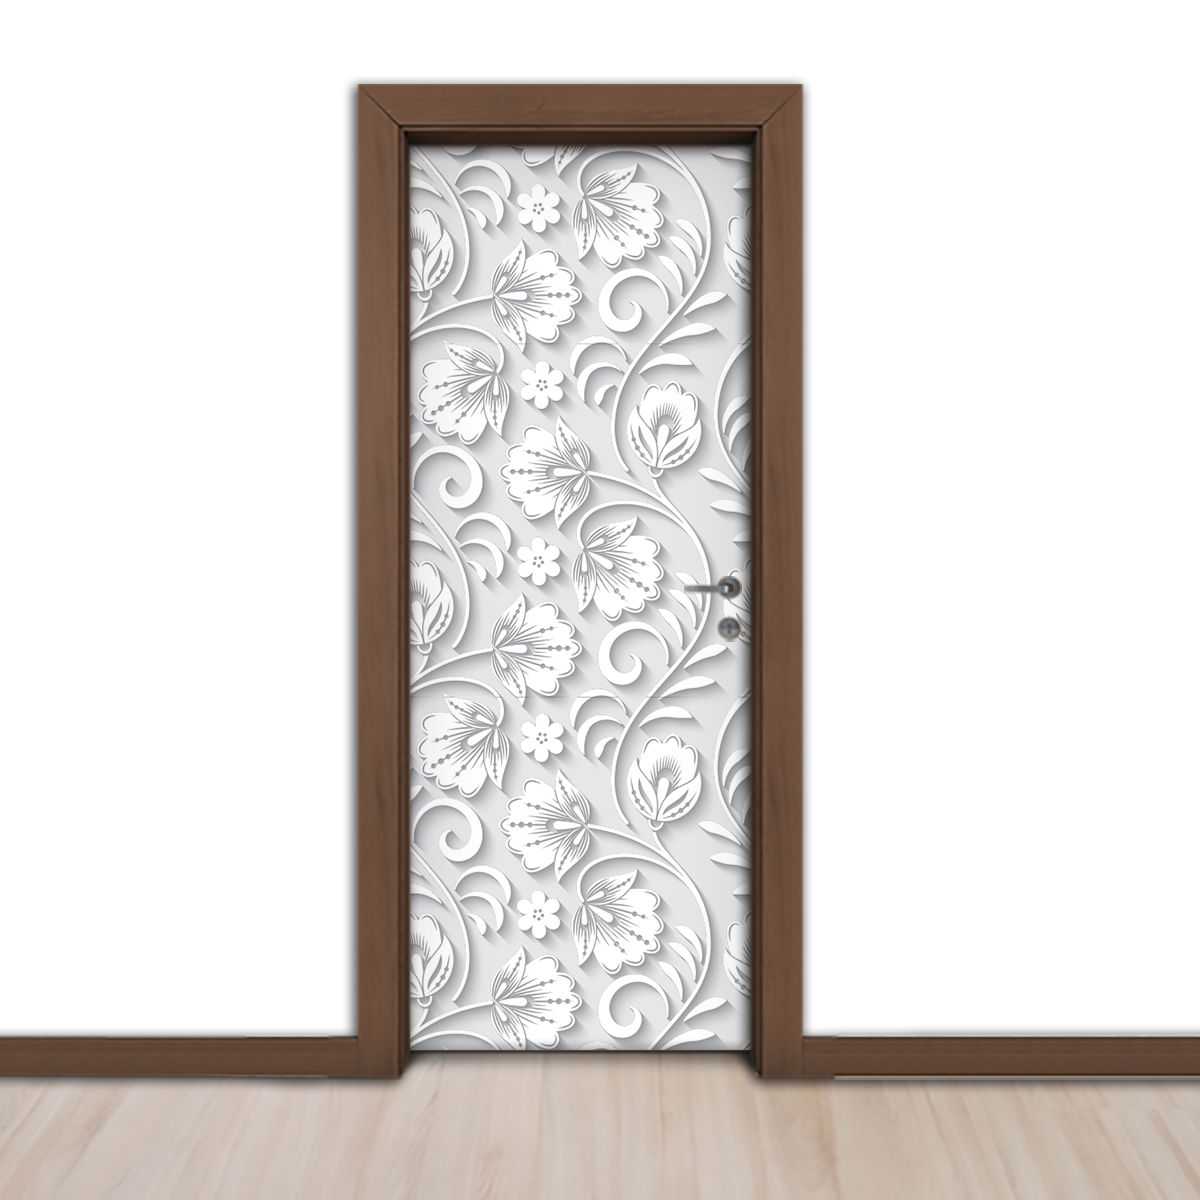 ADESIVO DE PORTA - Floral 3D 5